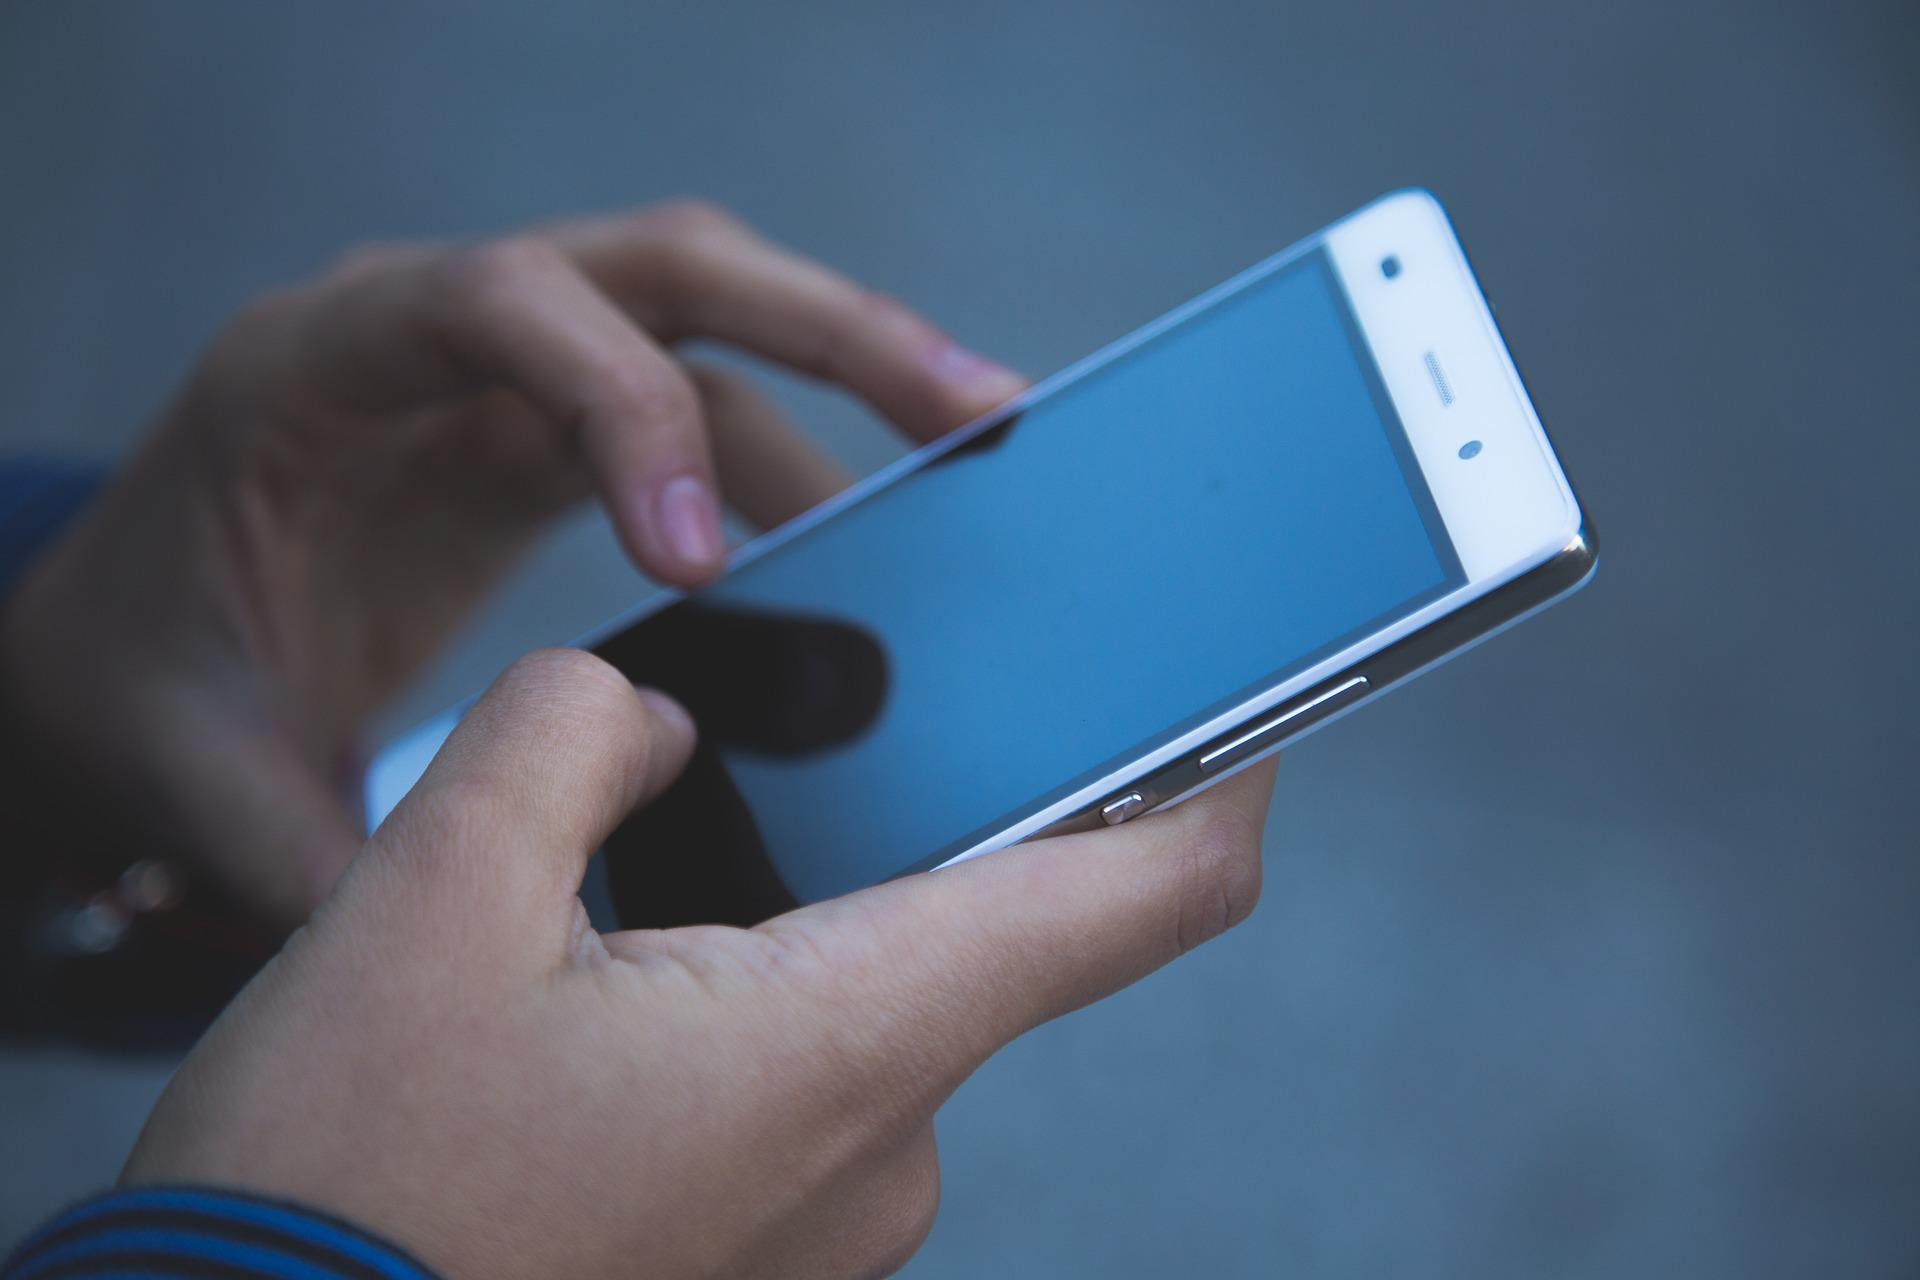 Xiaomi note 10 pro review in Bangladesh